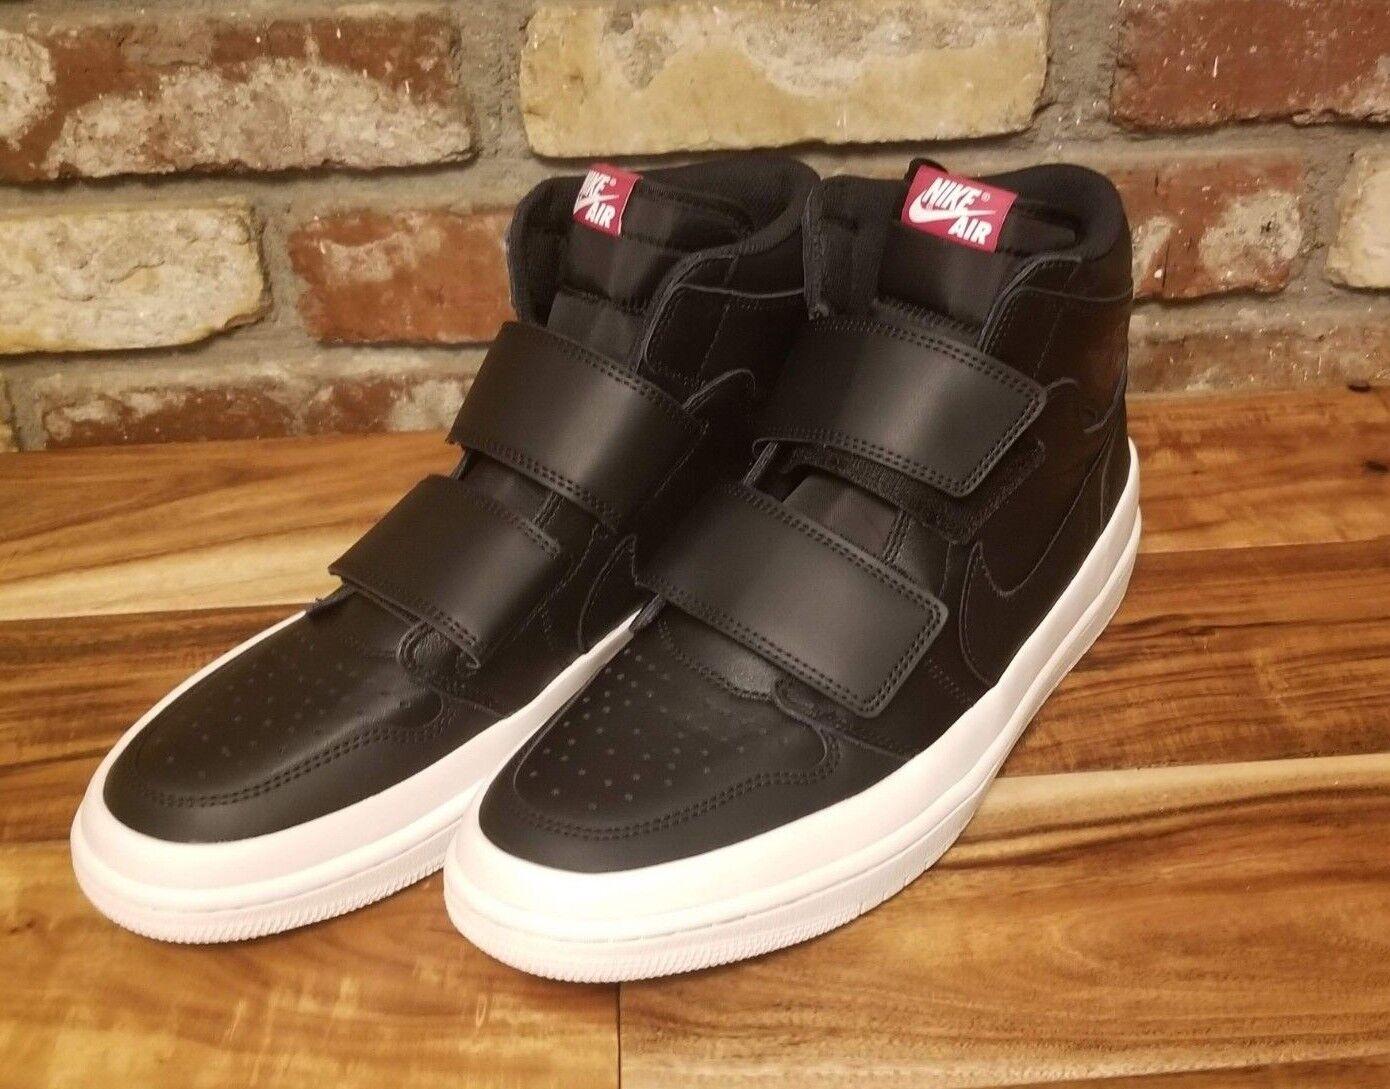 Nike Jordan 1 Retro High Double Strap DS Black Sail White Size 11.5